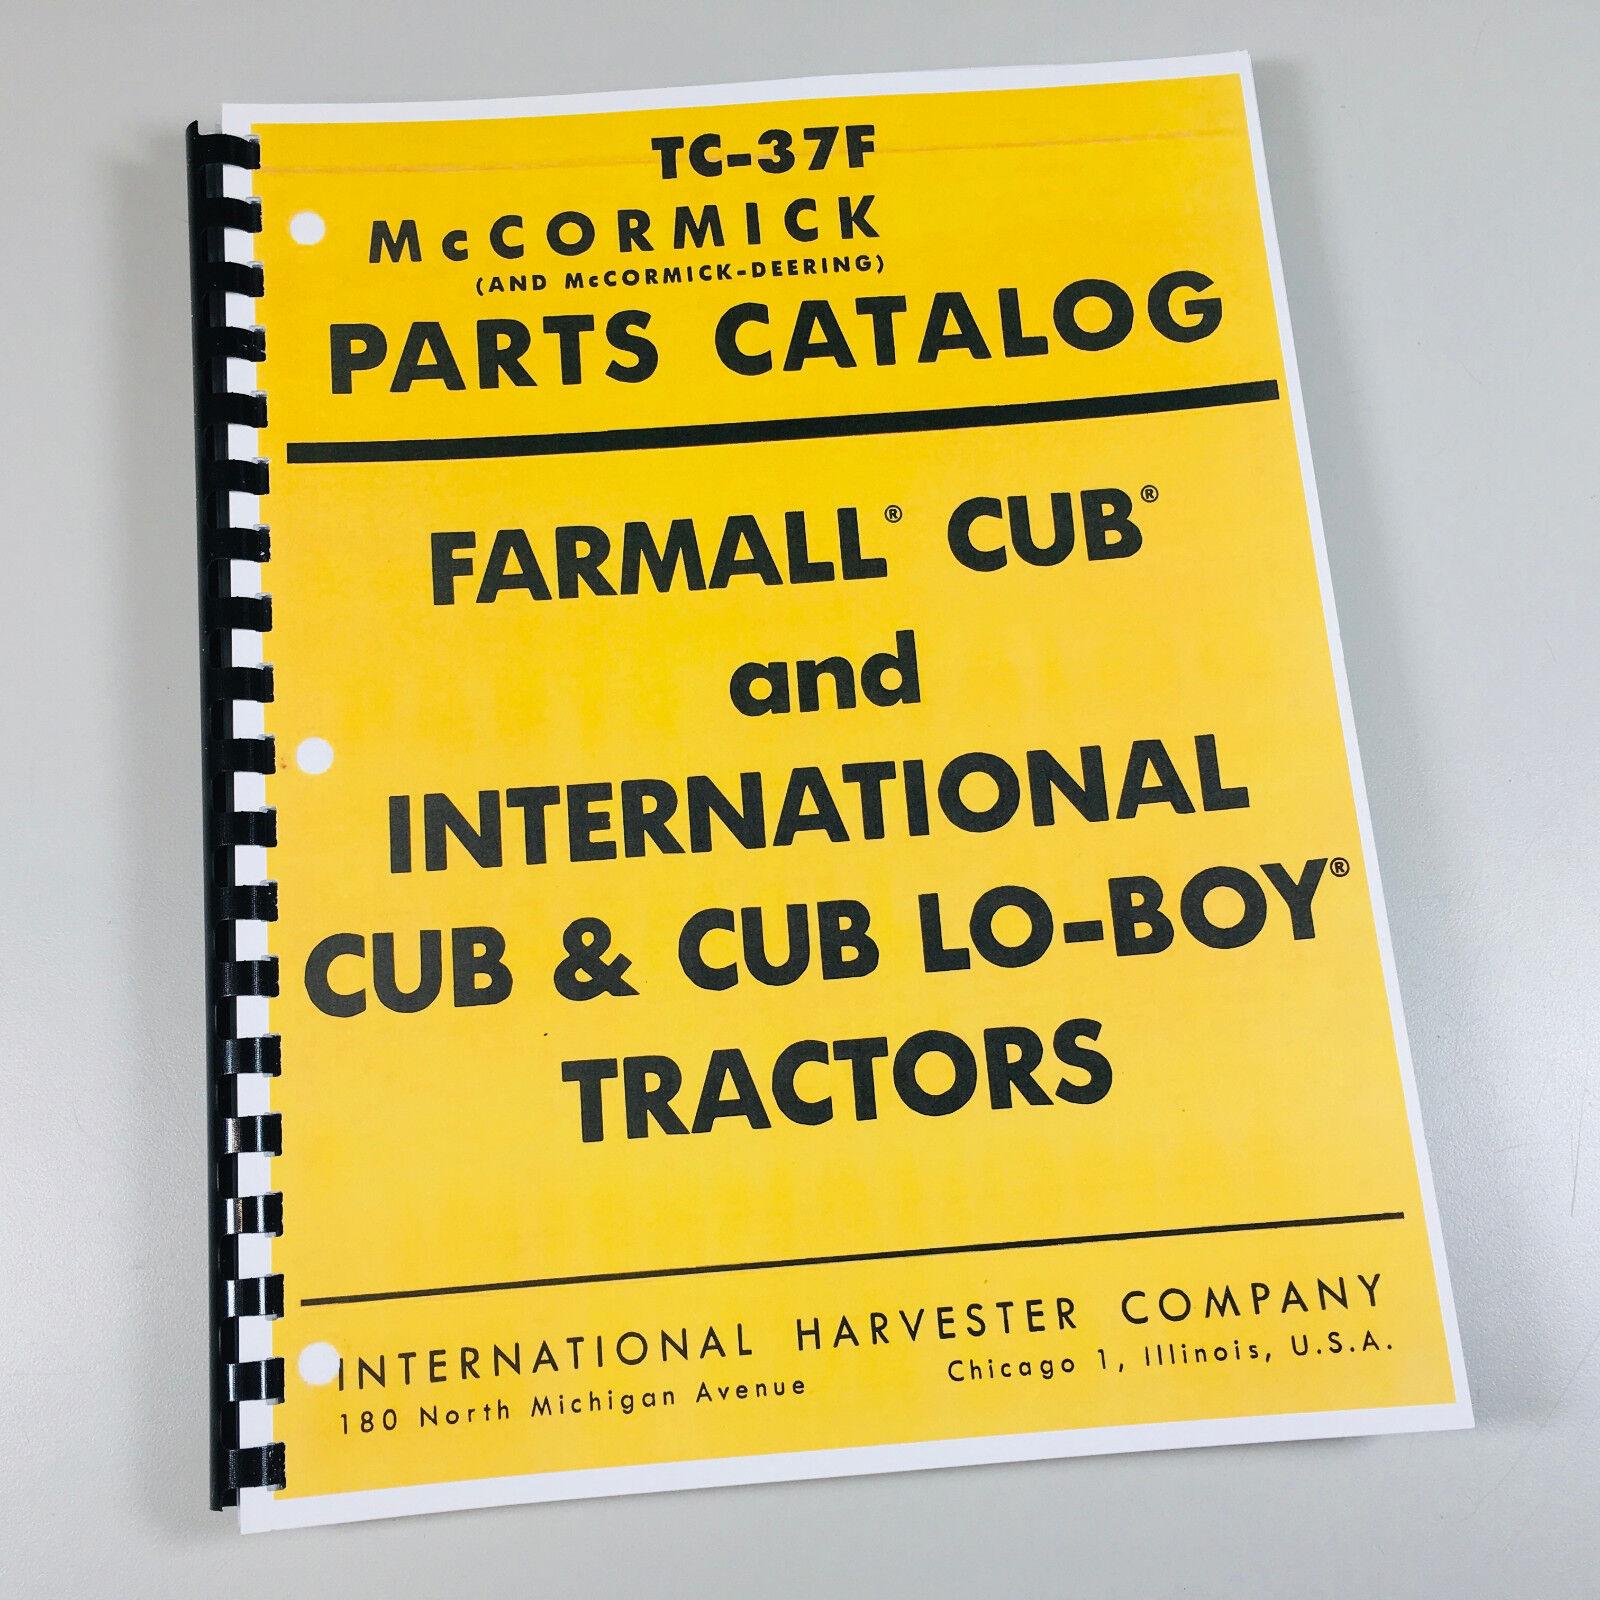 details about farmall cub international cub lo boy tractor parts manual  catalog mccormick